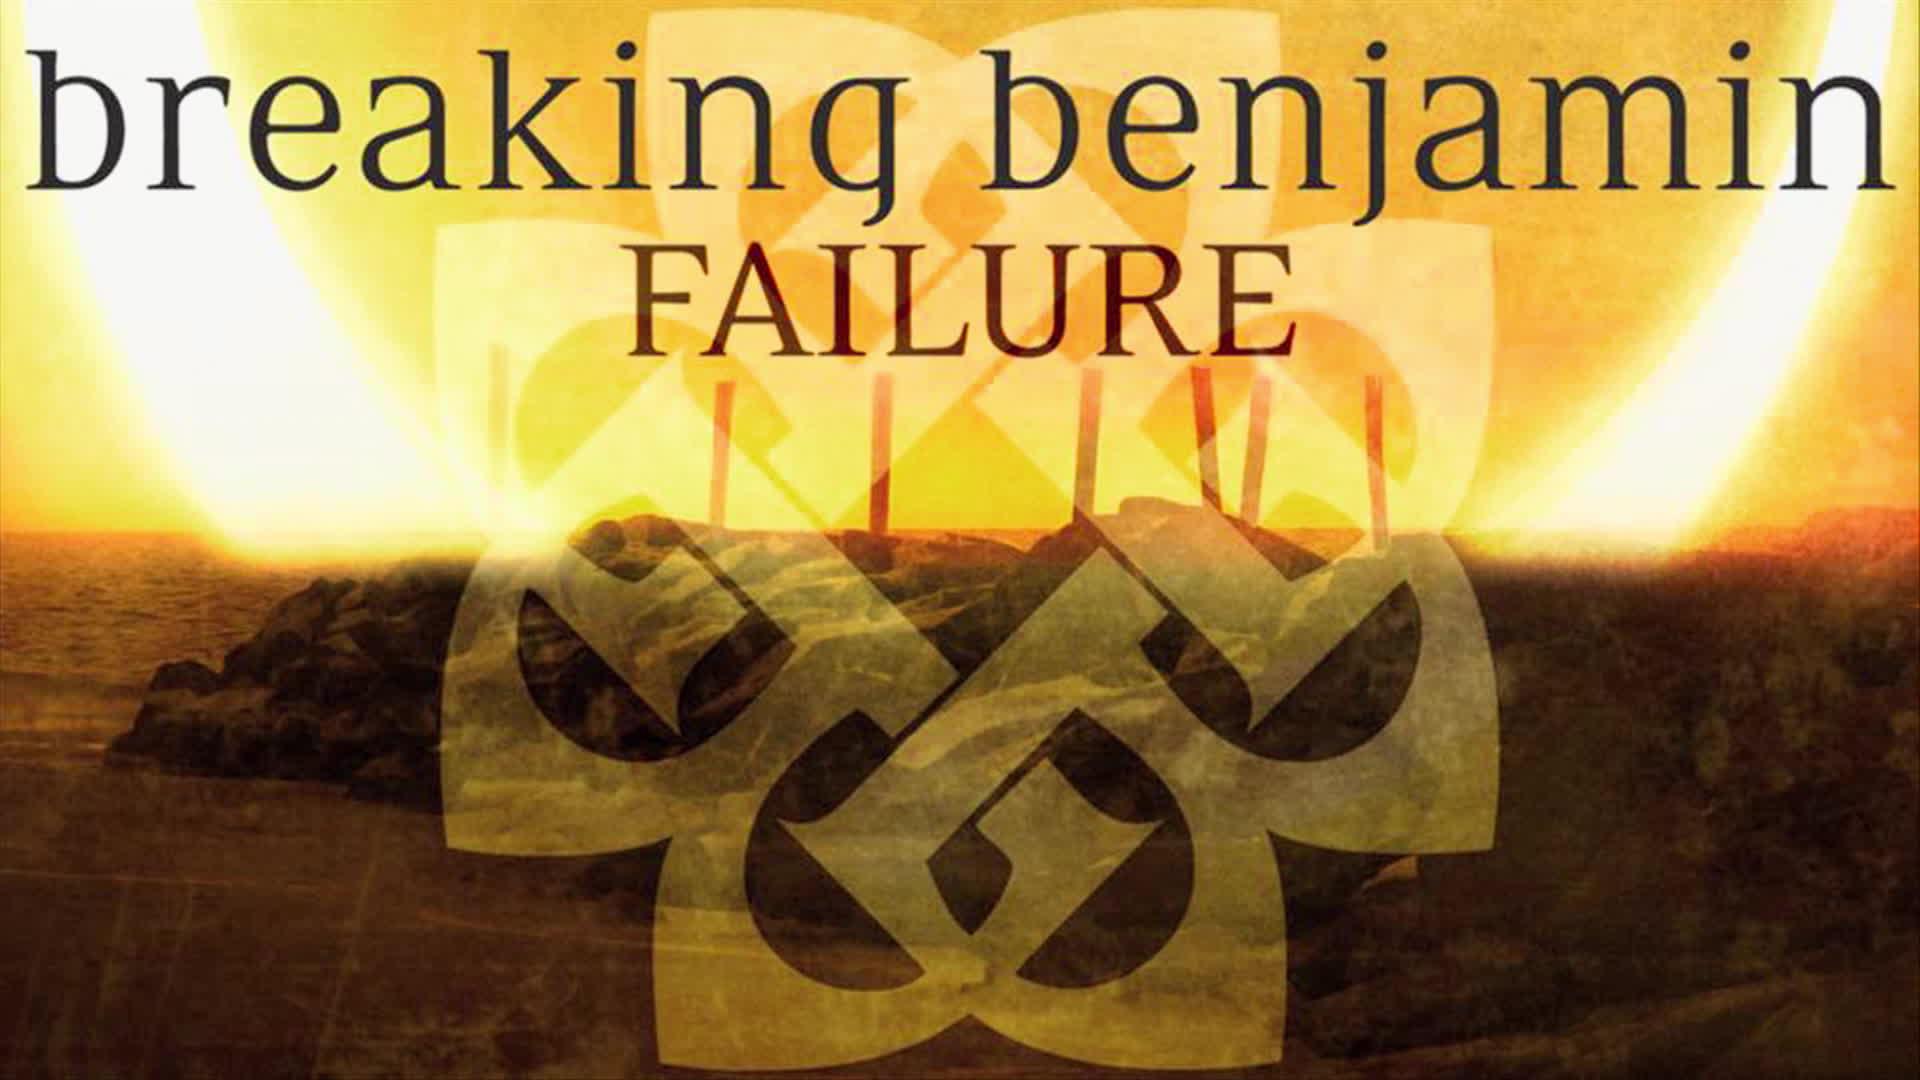 Breaking Benjamin, Failure